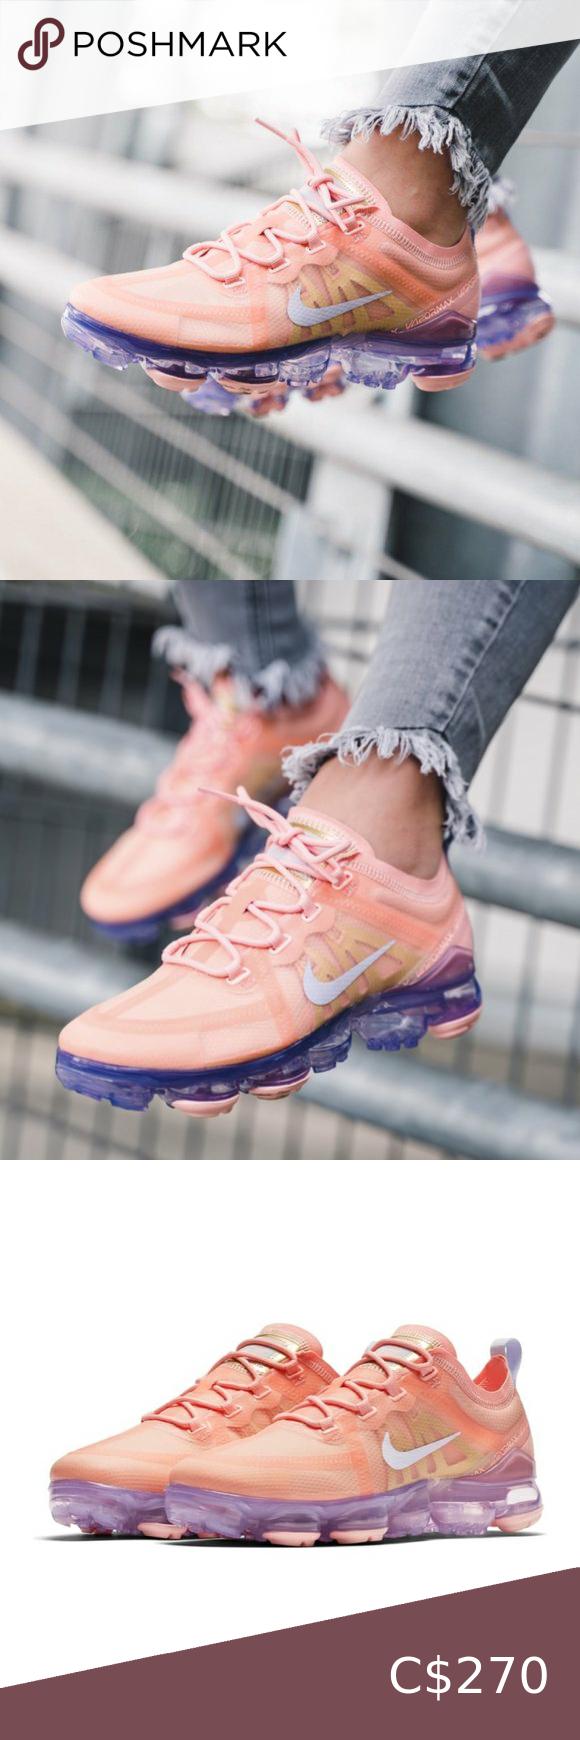 NWT Nike Air VaporMax Coral/Purple 2019 Sneaker in 2020